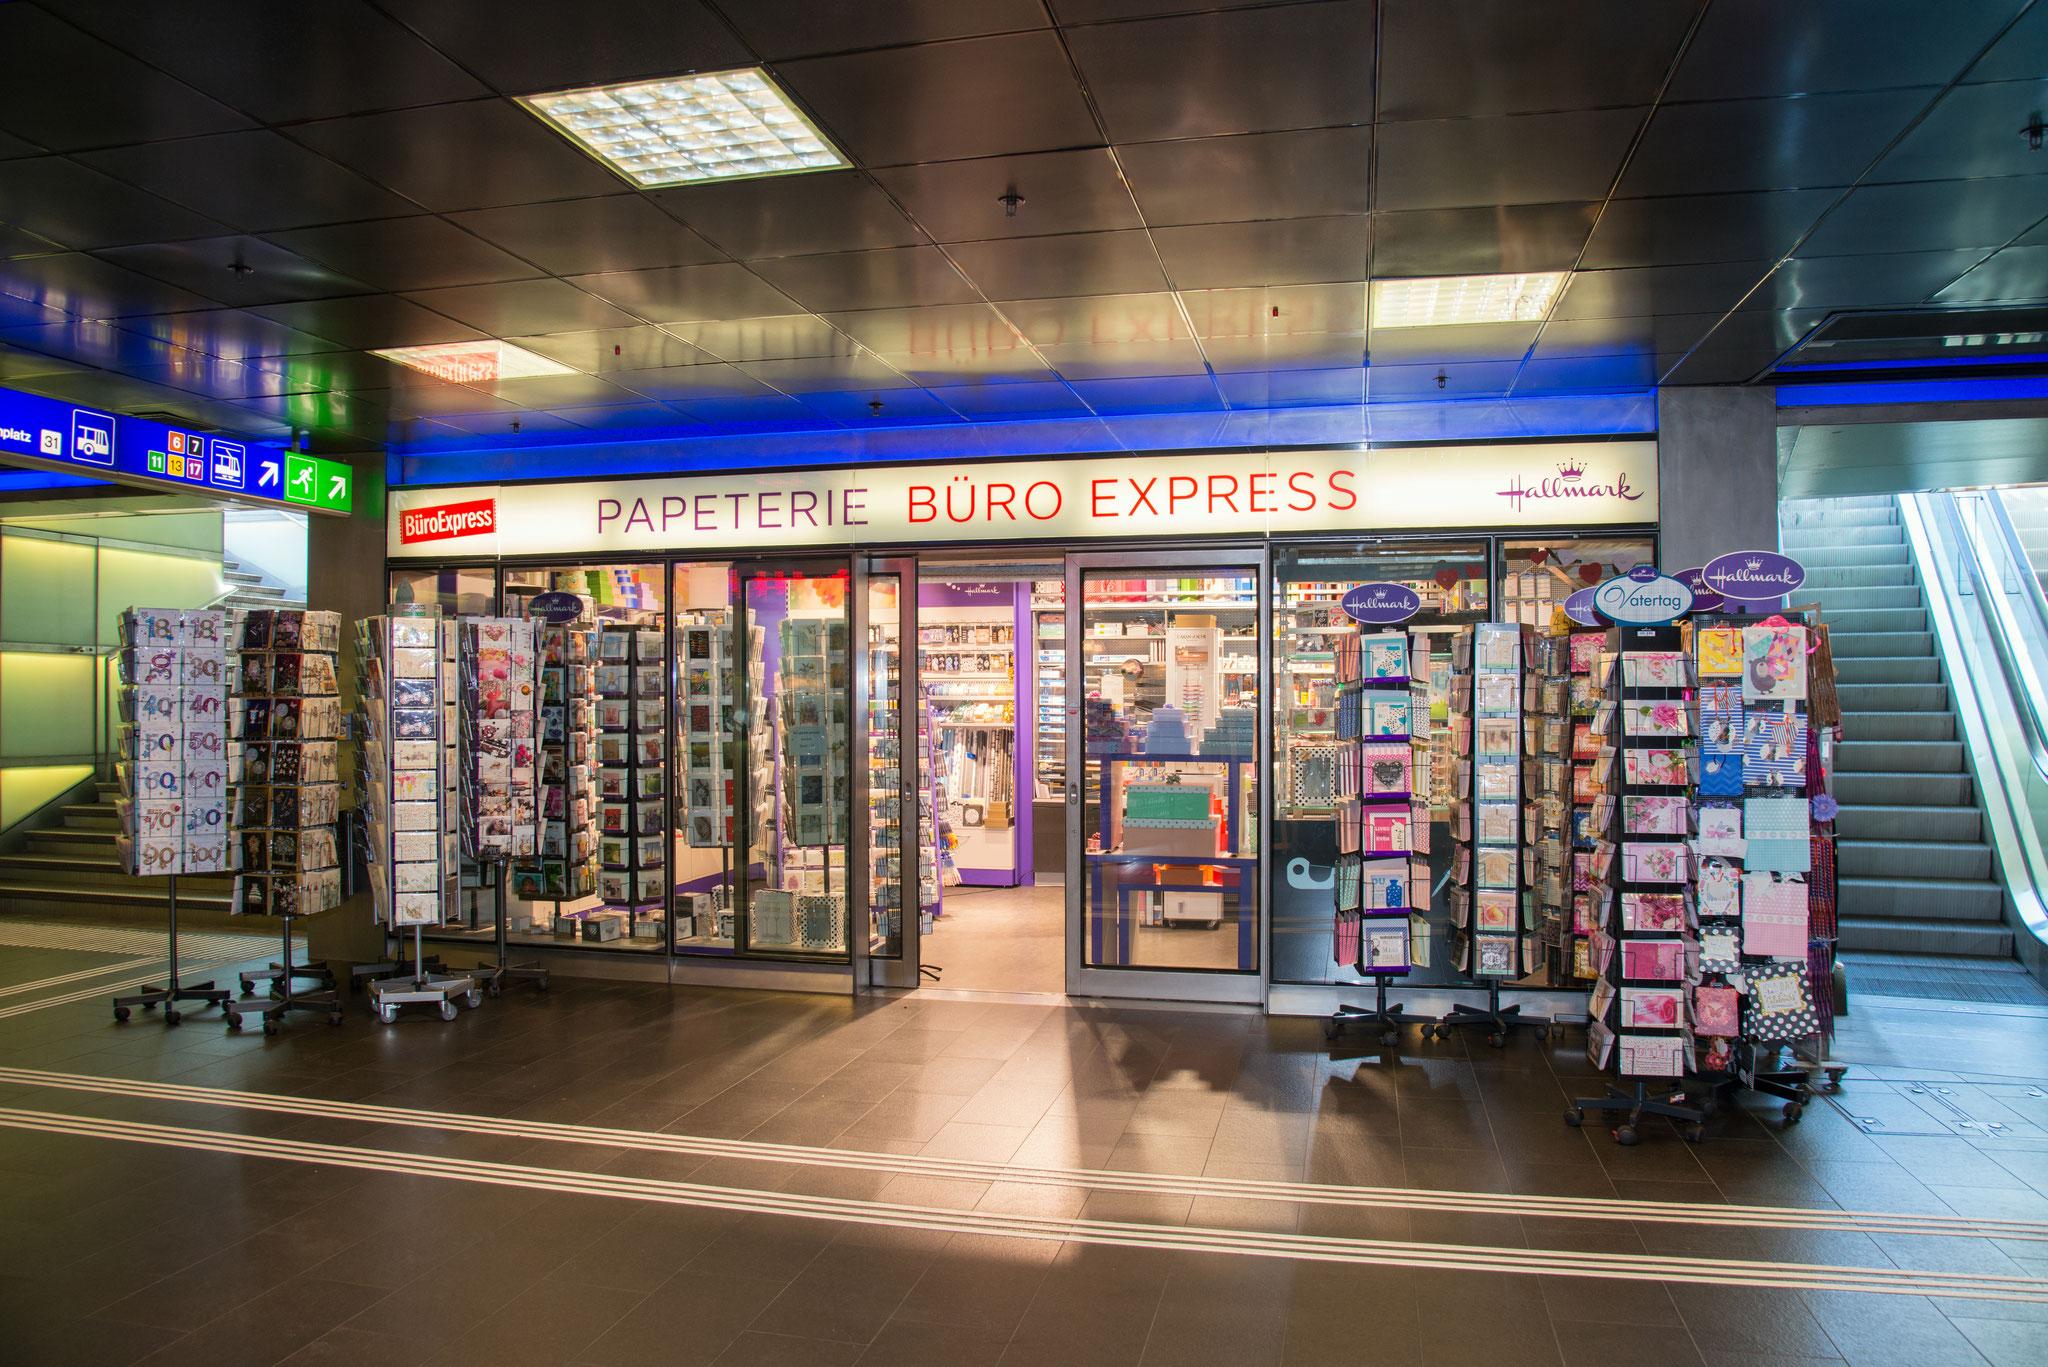 Papeterie Shopville Zh Hb Und Bahnhof Zh Enge Buroexpress Mit Copy